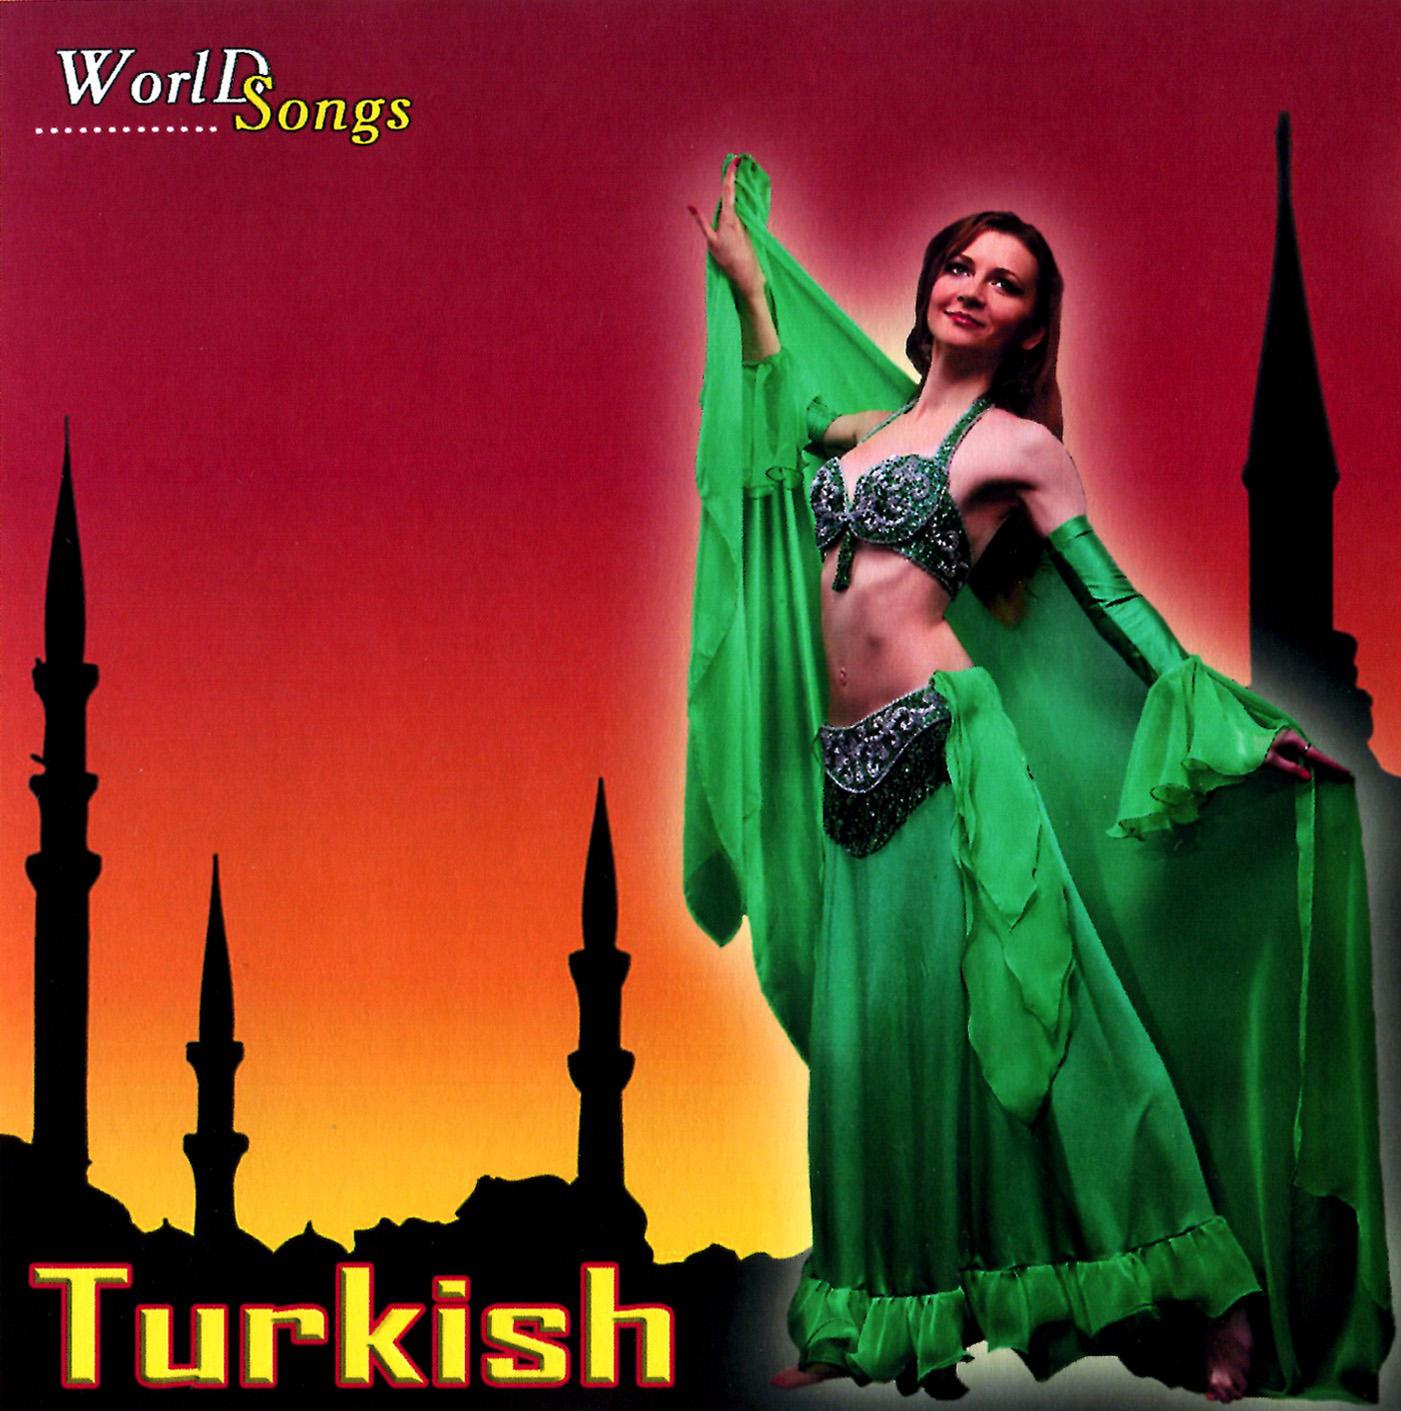 Turkish [mp3]